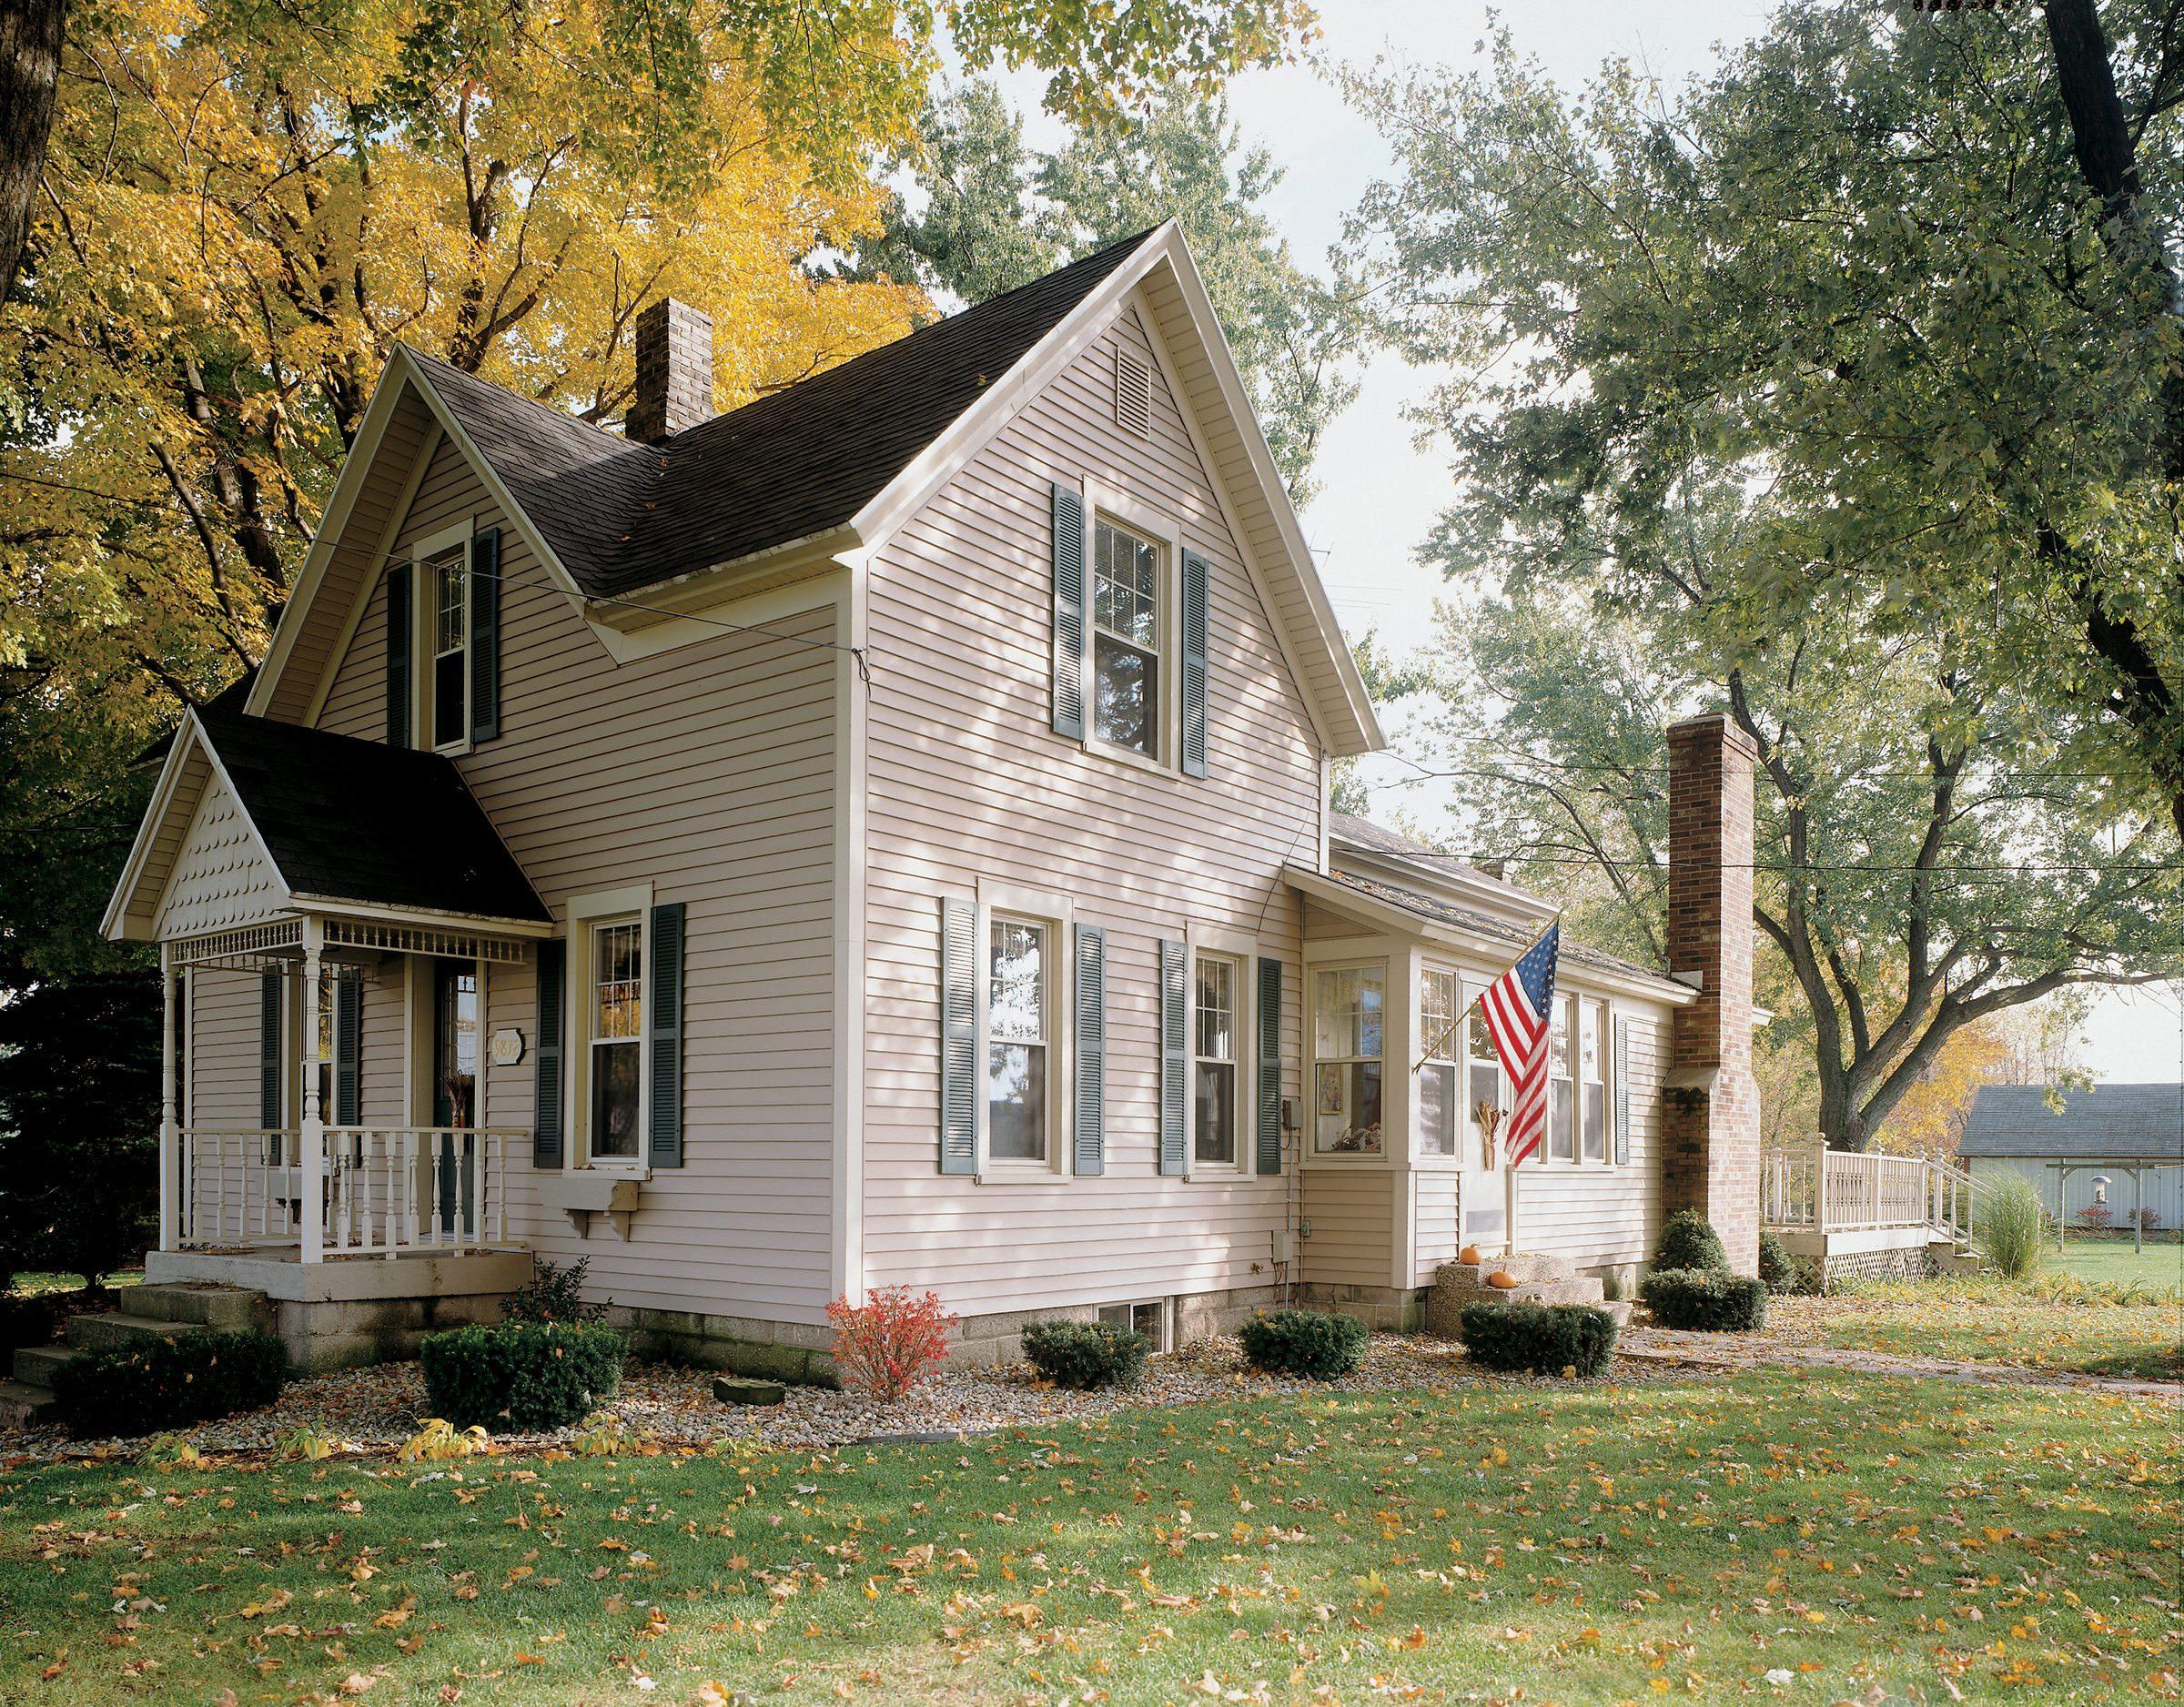 Mastic Home Exteriors And Siding ProductsA.B. Edward